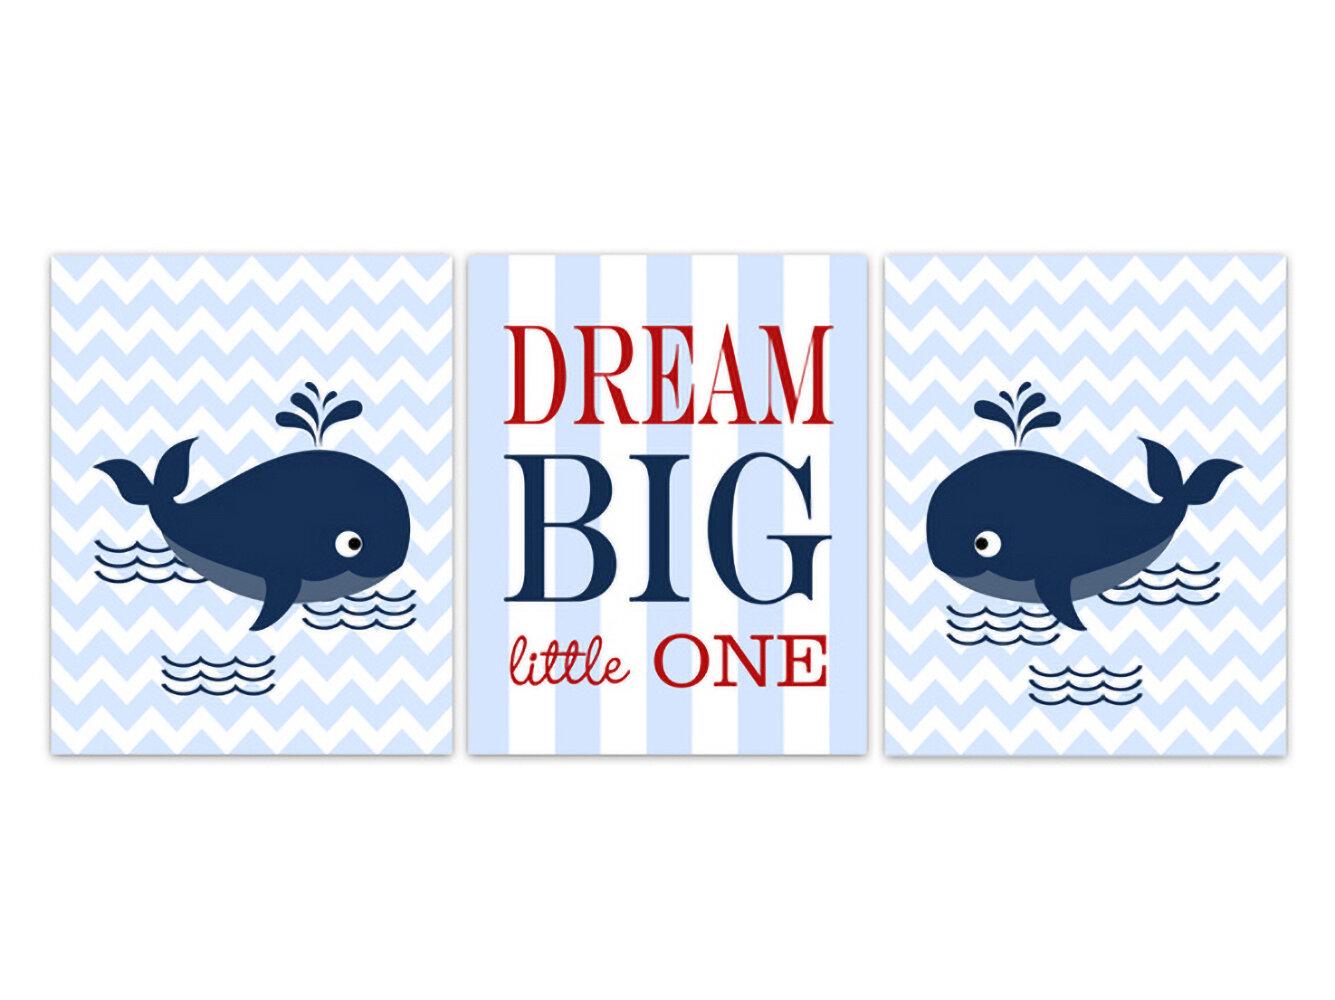 Set of 3 Dream Big ABC My Little Star Grey Prints Nursery Kids Room Wall Art